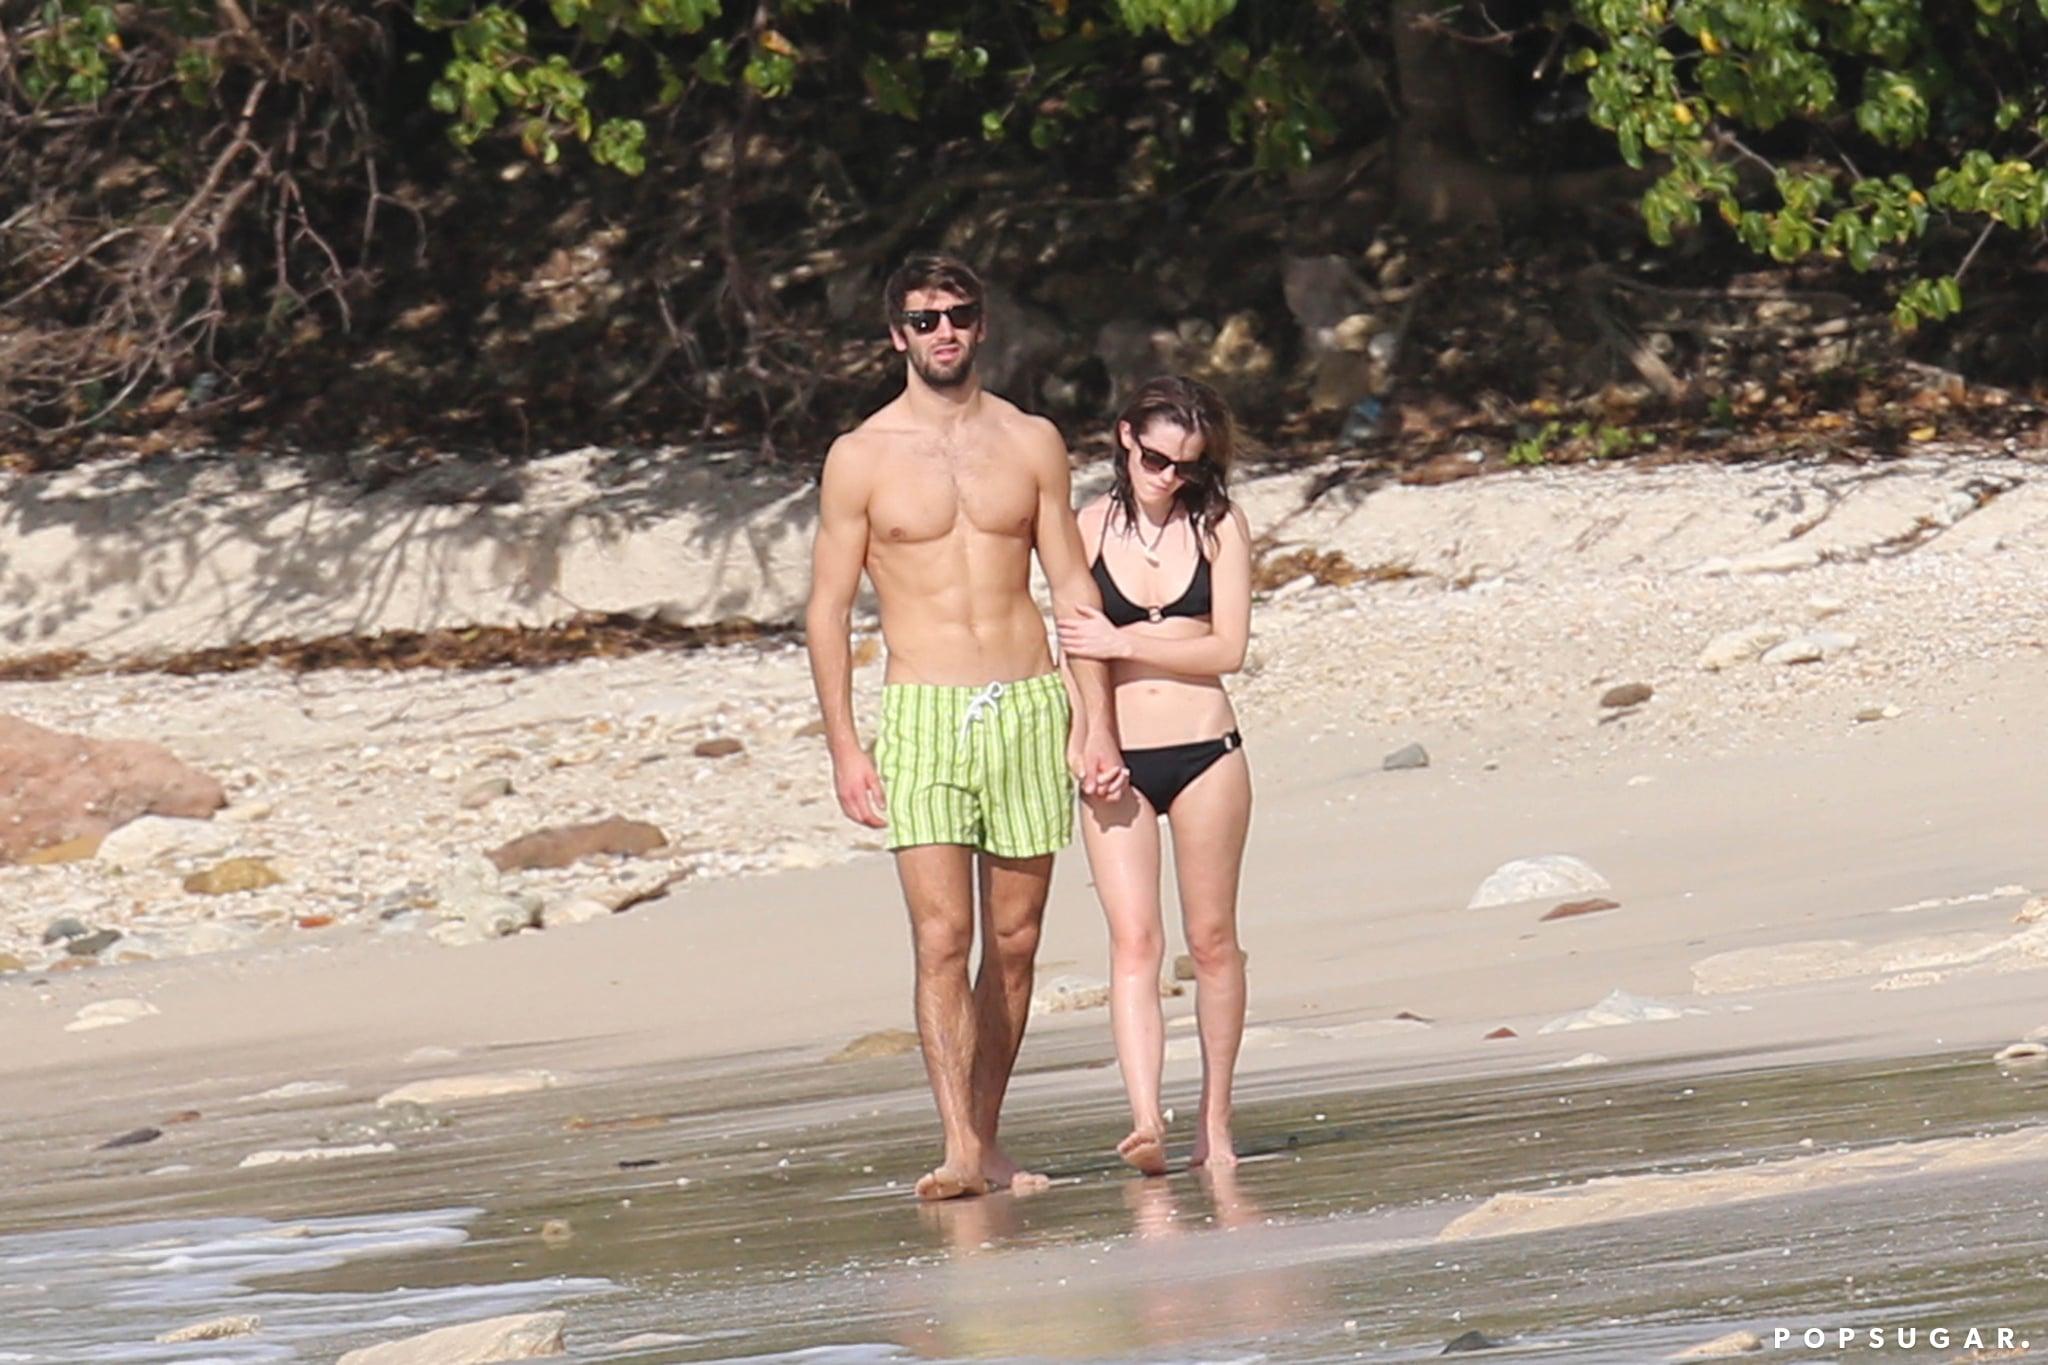 Emma Brings Her Bikini Body and Her New Man to the Beach